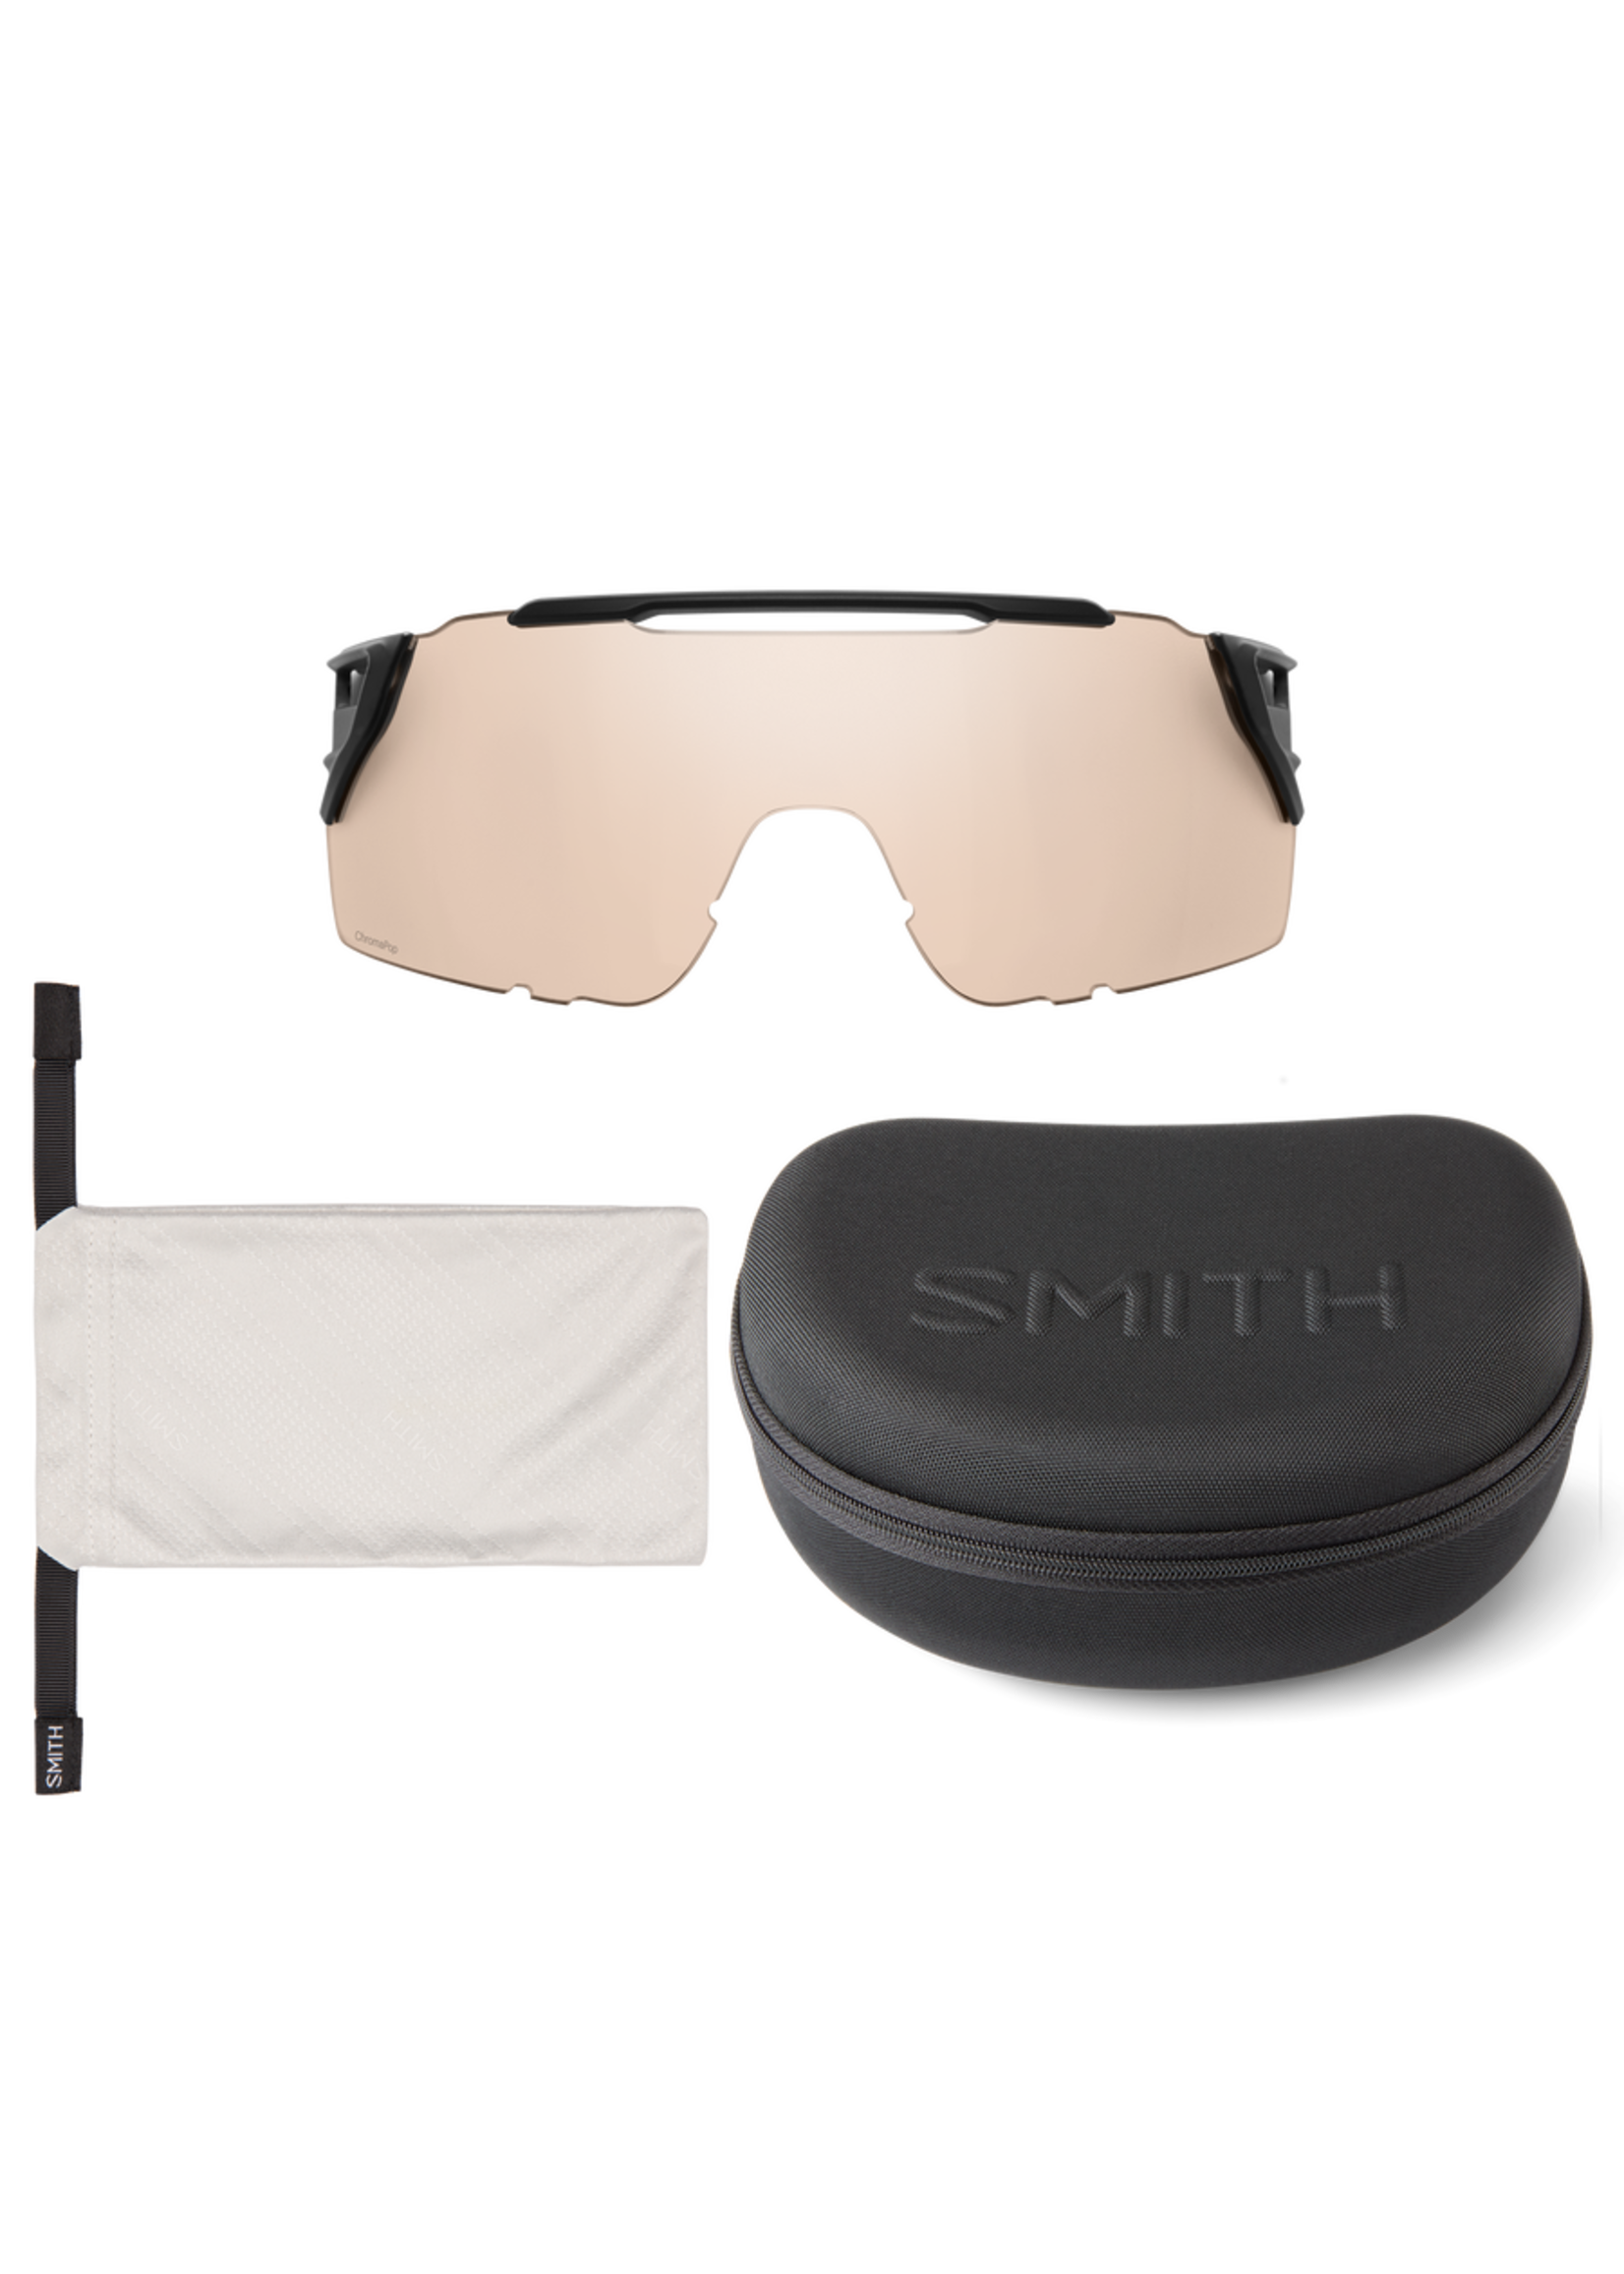 SMITH SMITH ATTACK MTB MATTE BLACK CHROMAPOP BLACK